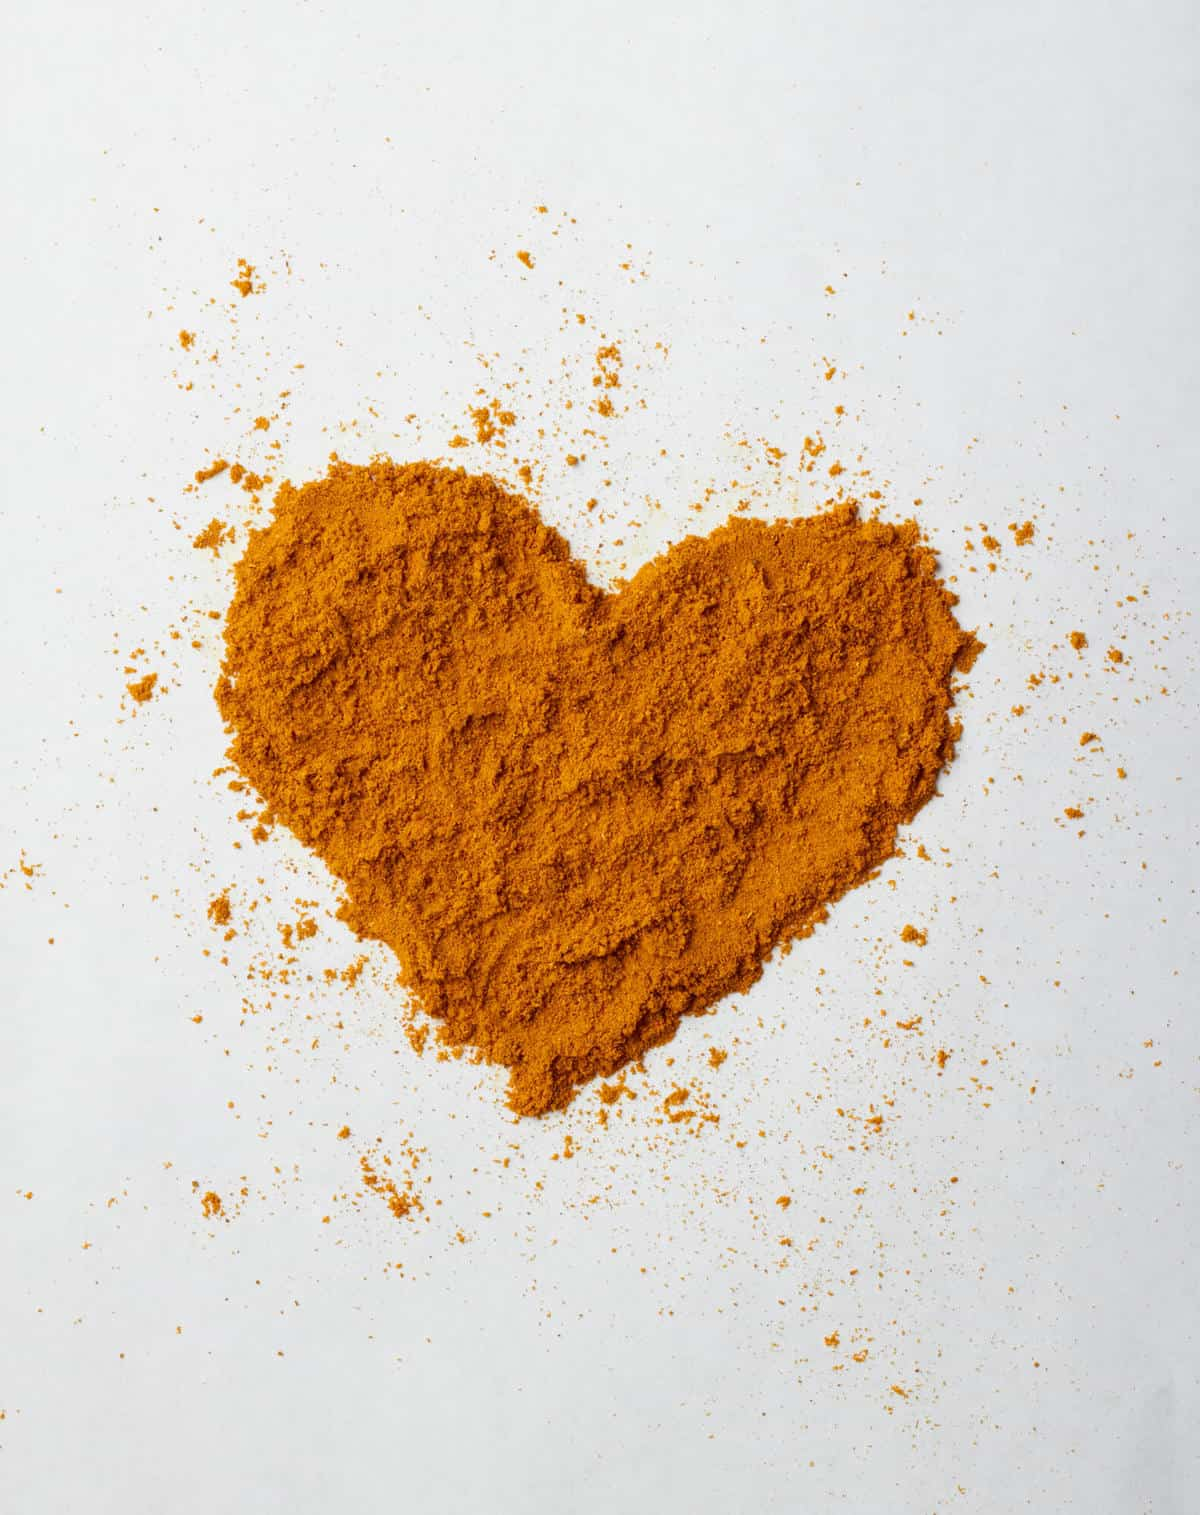 Turmeric powder in a heart shape